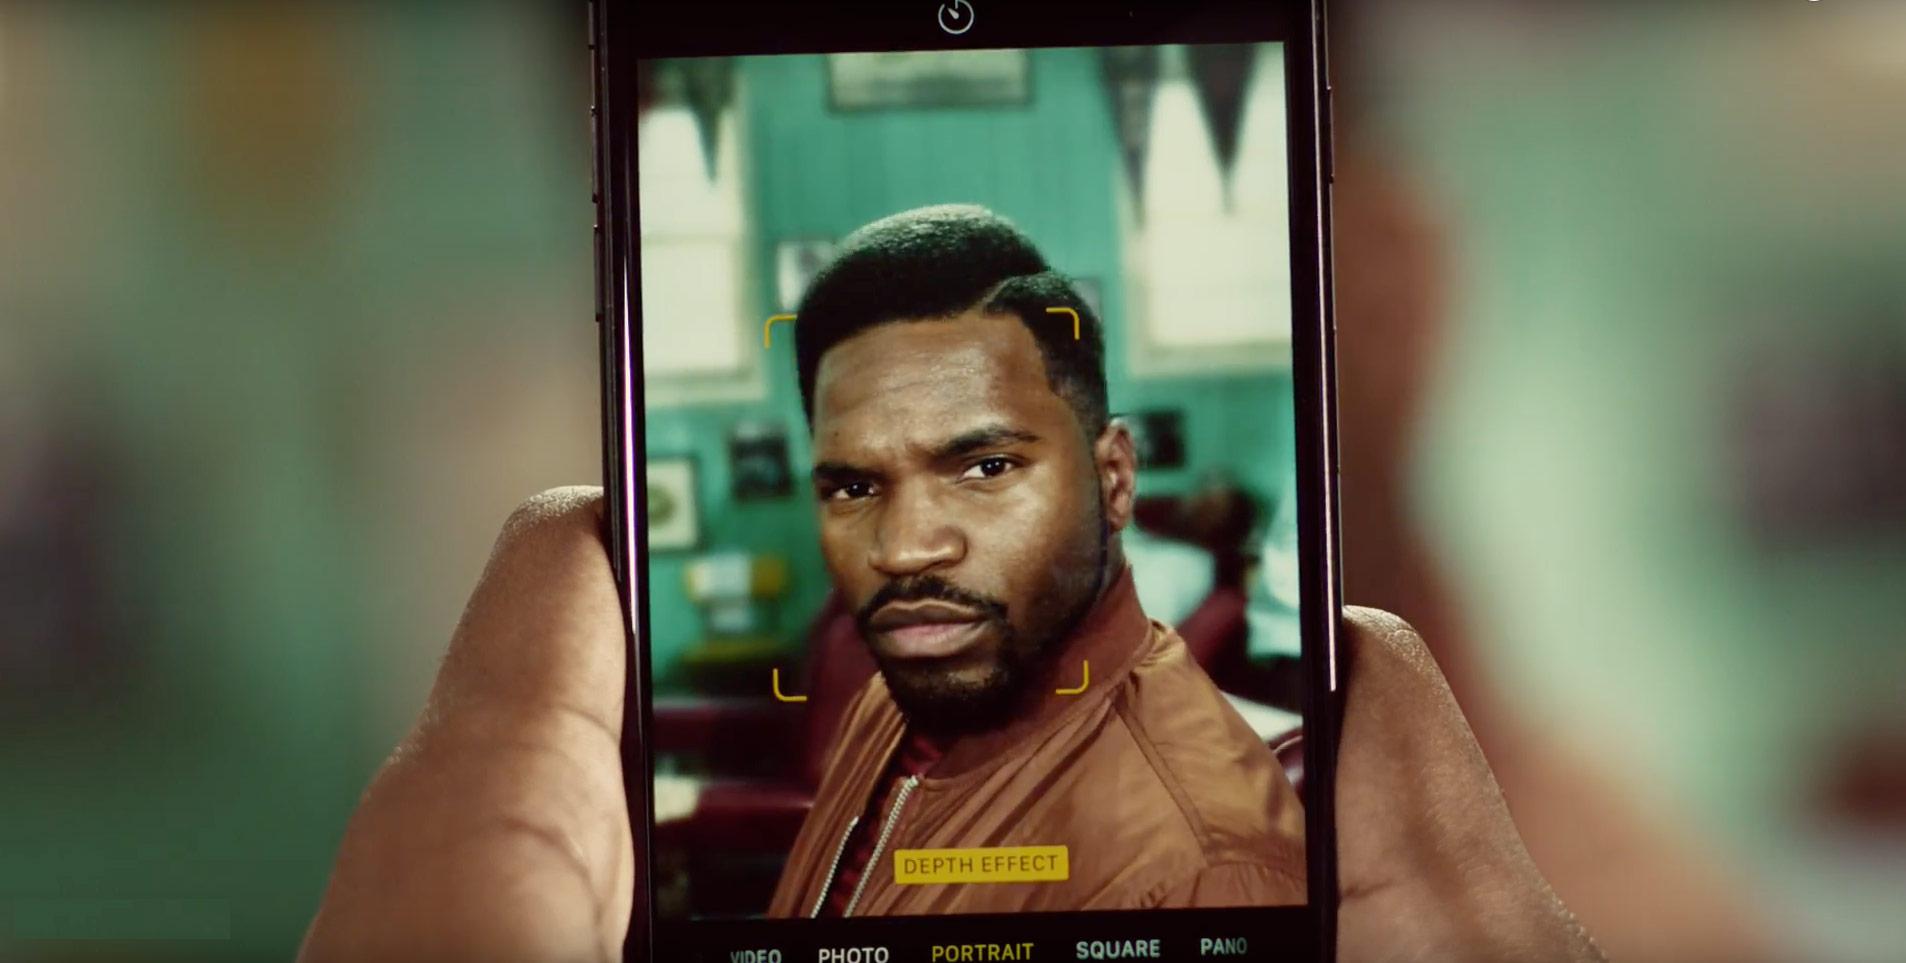 The Latest Apple Ad Again Focuses on the iPhone 7 Plus Portrait Mode